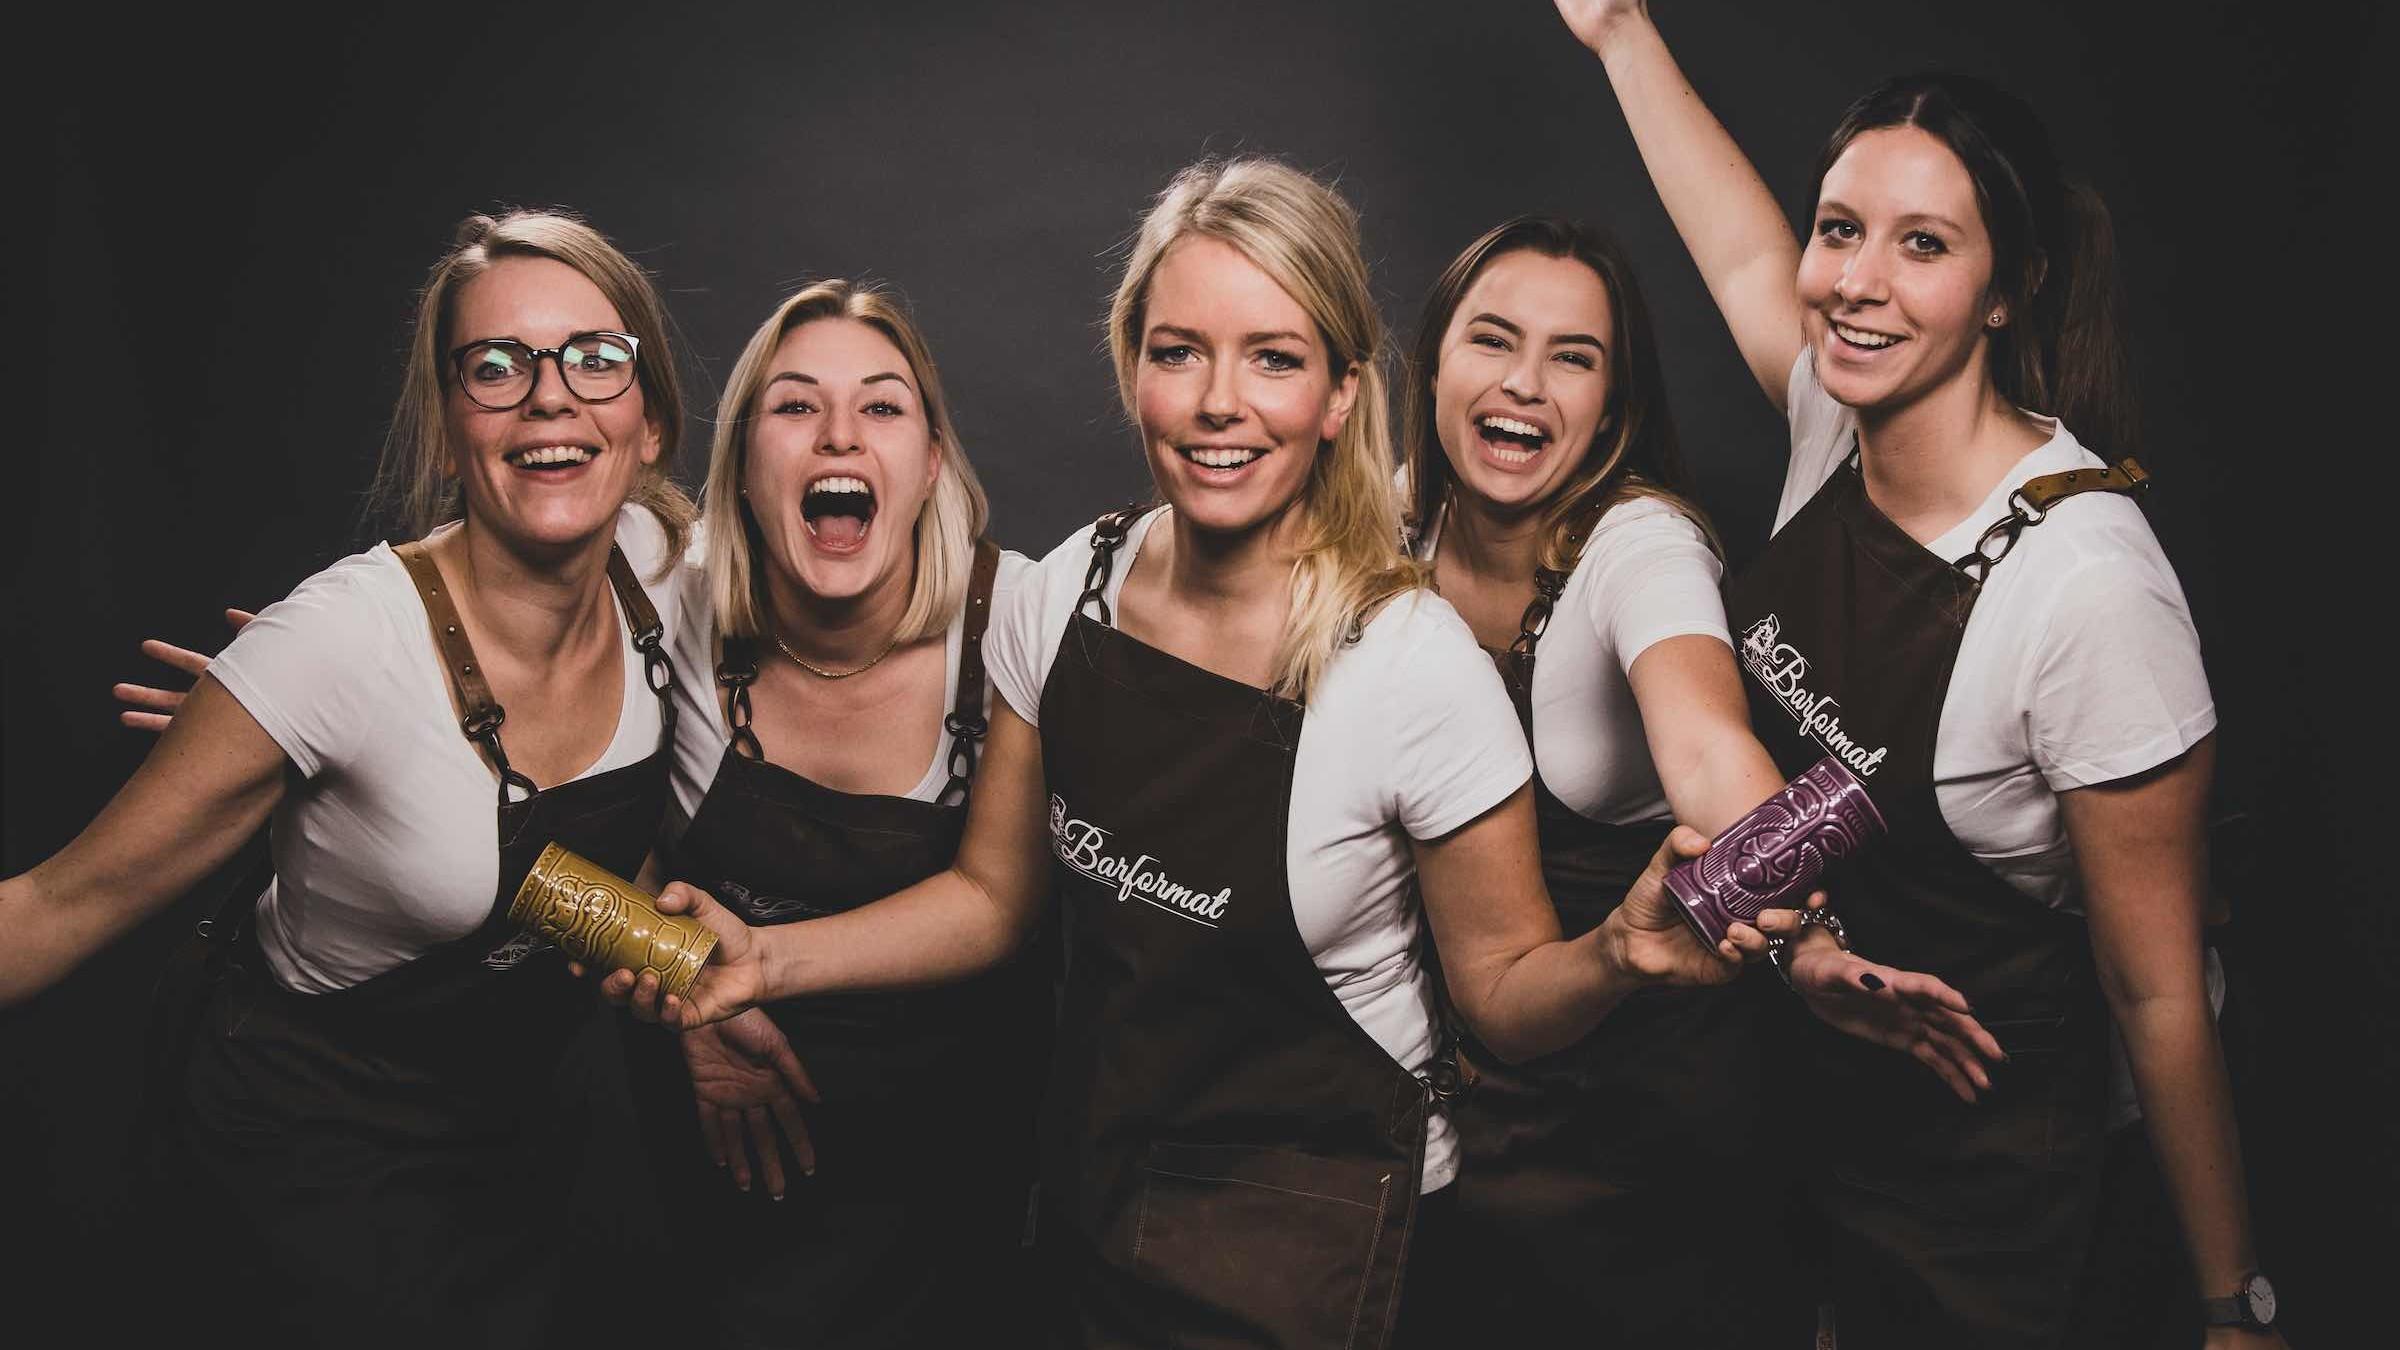 Glitzerplatte | Partner | Barformat | Mobile | Bar | Cocktailservice | Hannover | Weinbar | Ginbar | Tasting | Foodtruck | Bulli | Bar | Hannover | Ginbar | Weinbar | Kaffee | Bulli | Bar | Barkeeper | Mieten | Buchen